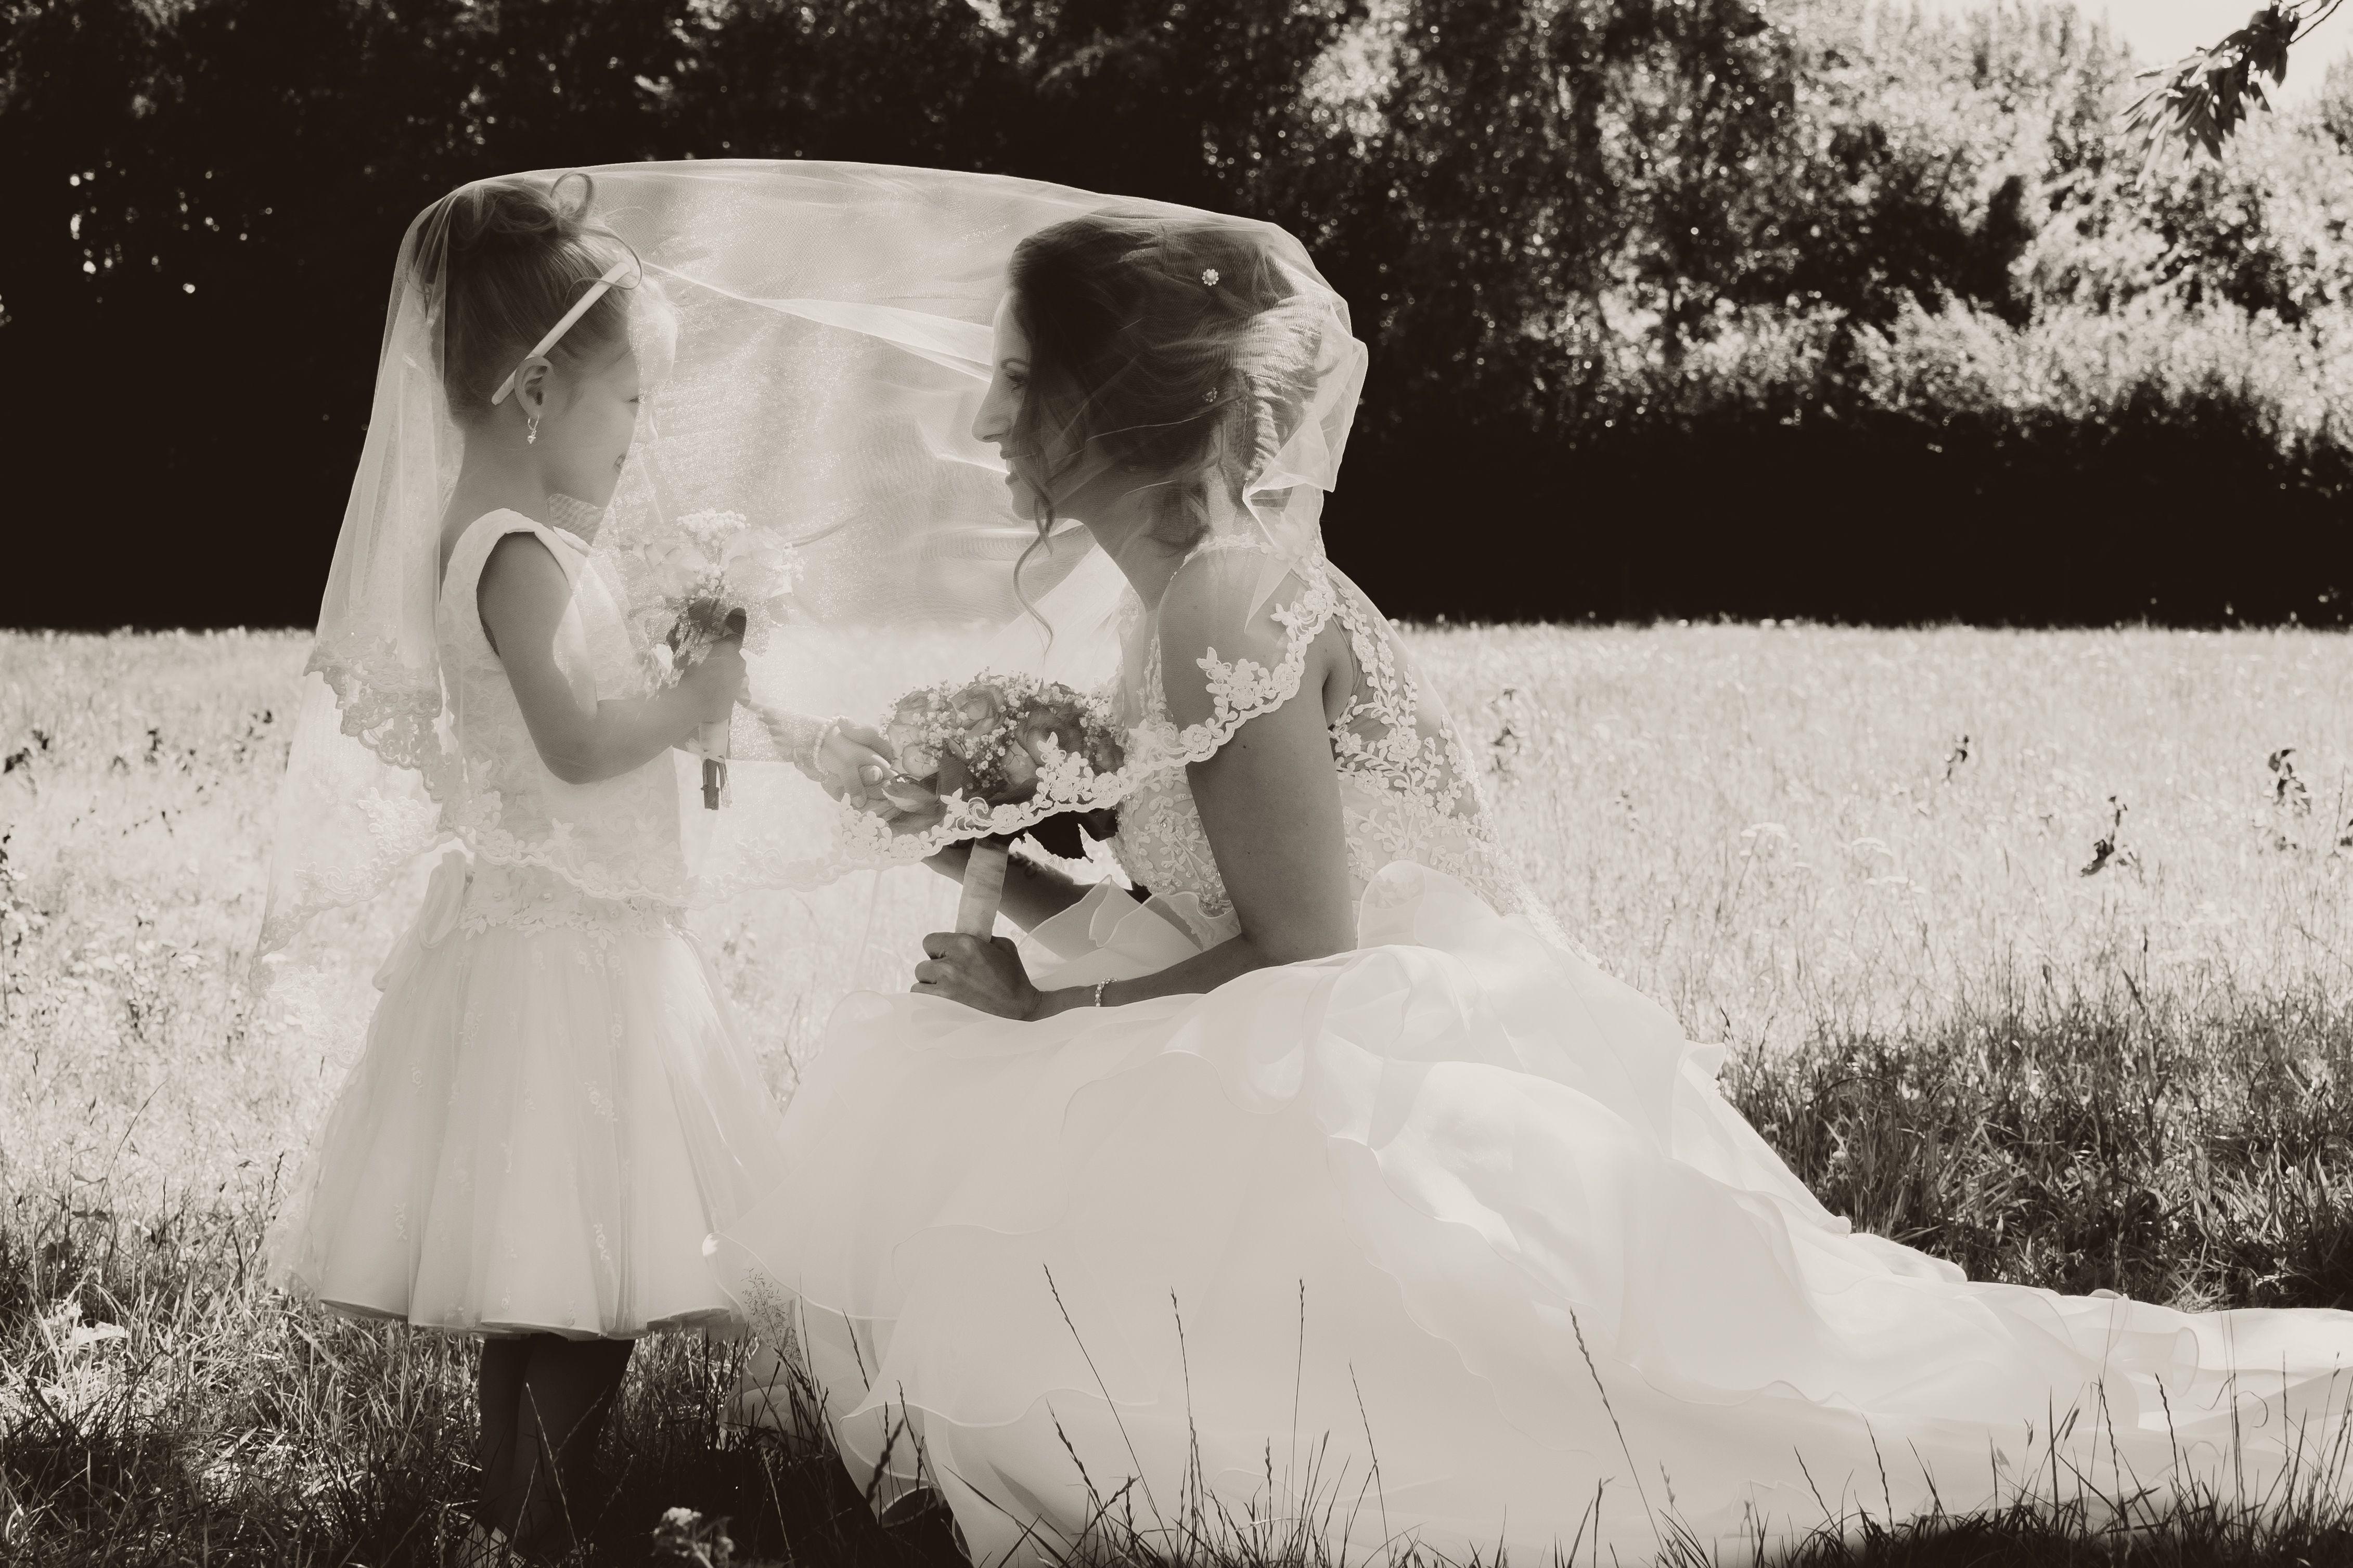 Moeder Dochter Wedding Bruiloft Trouwjurk Fotoshoot